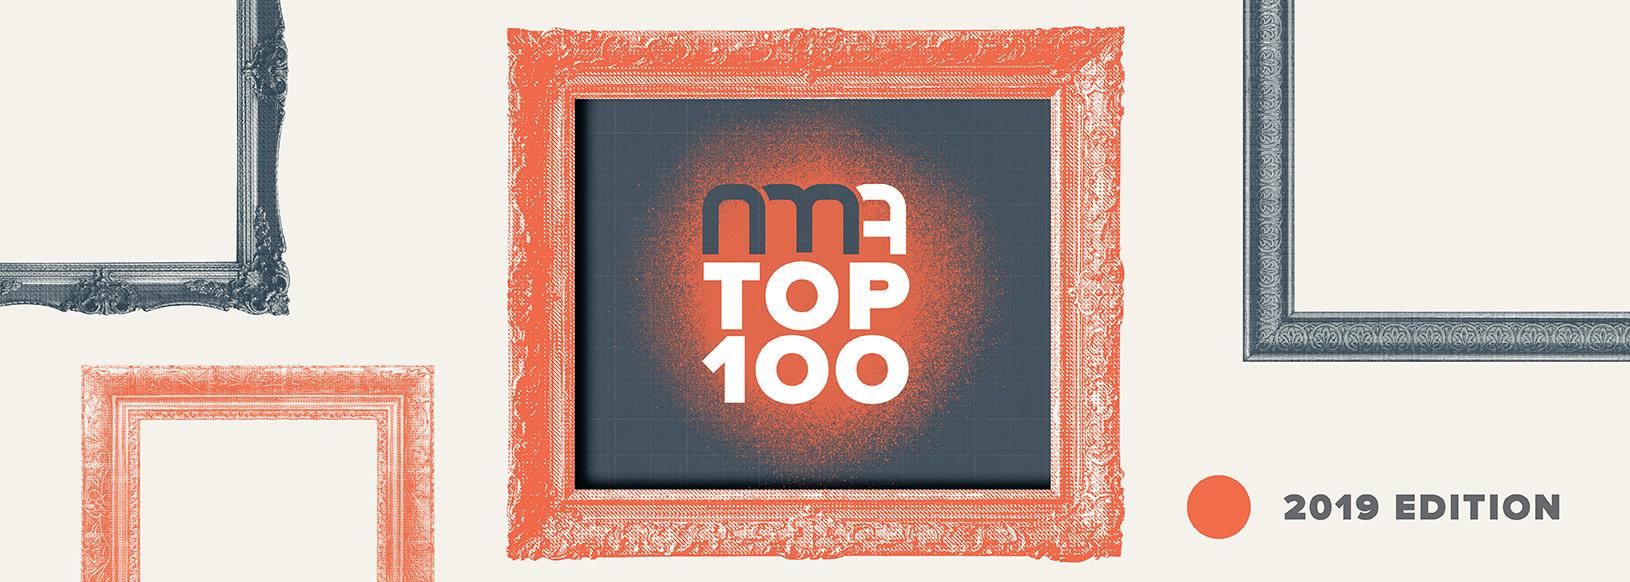 NMA Top 100 2019